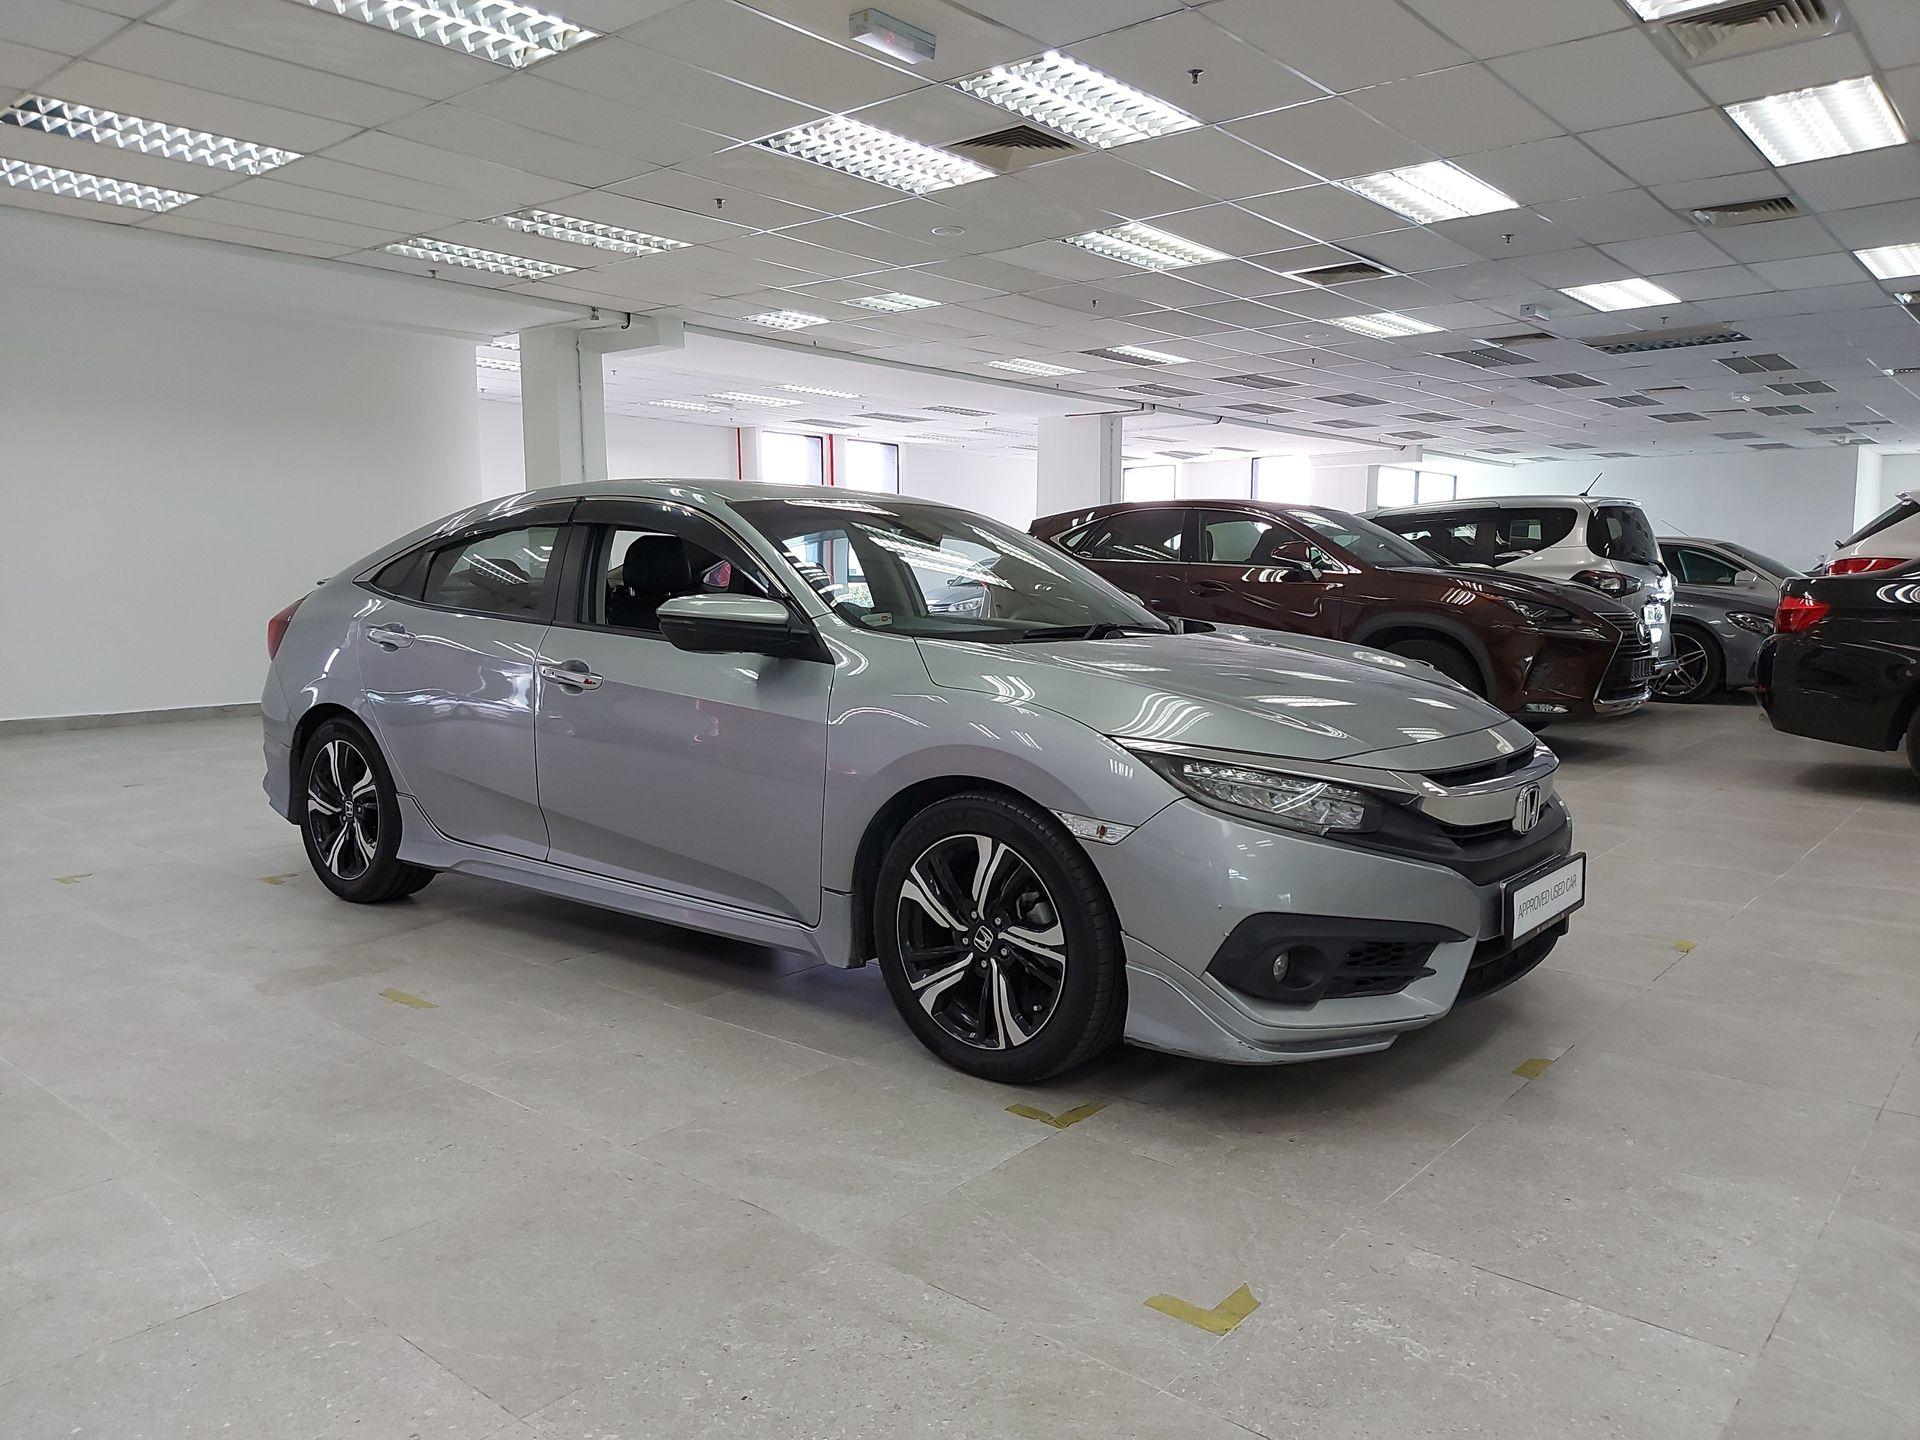 2017 Honda Civic 1.5 TC-P